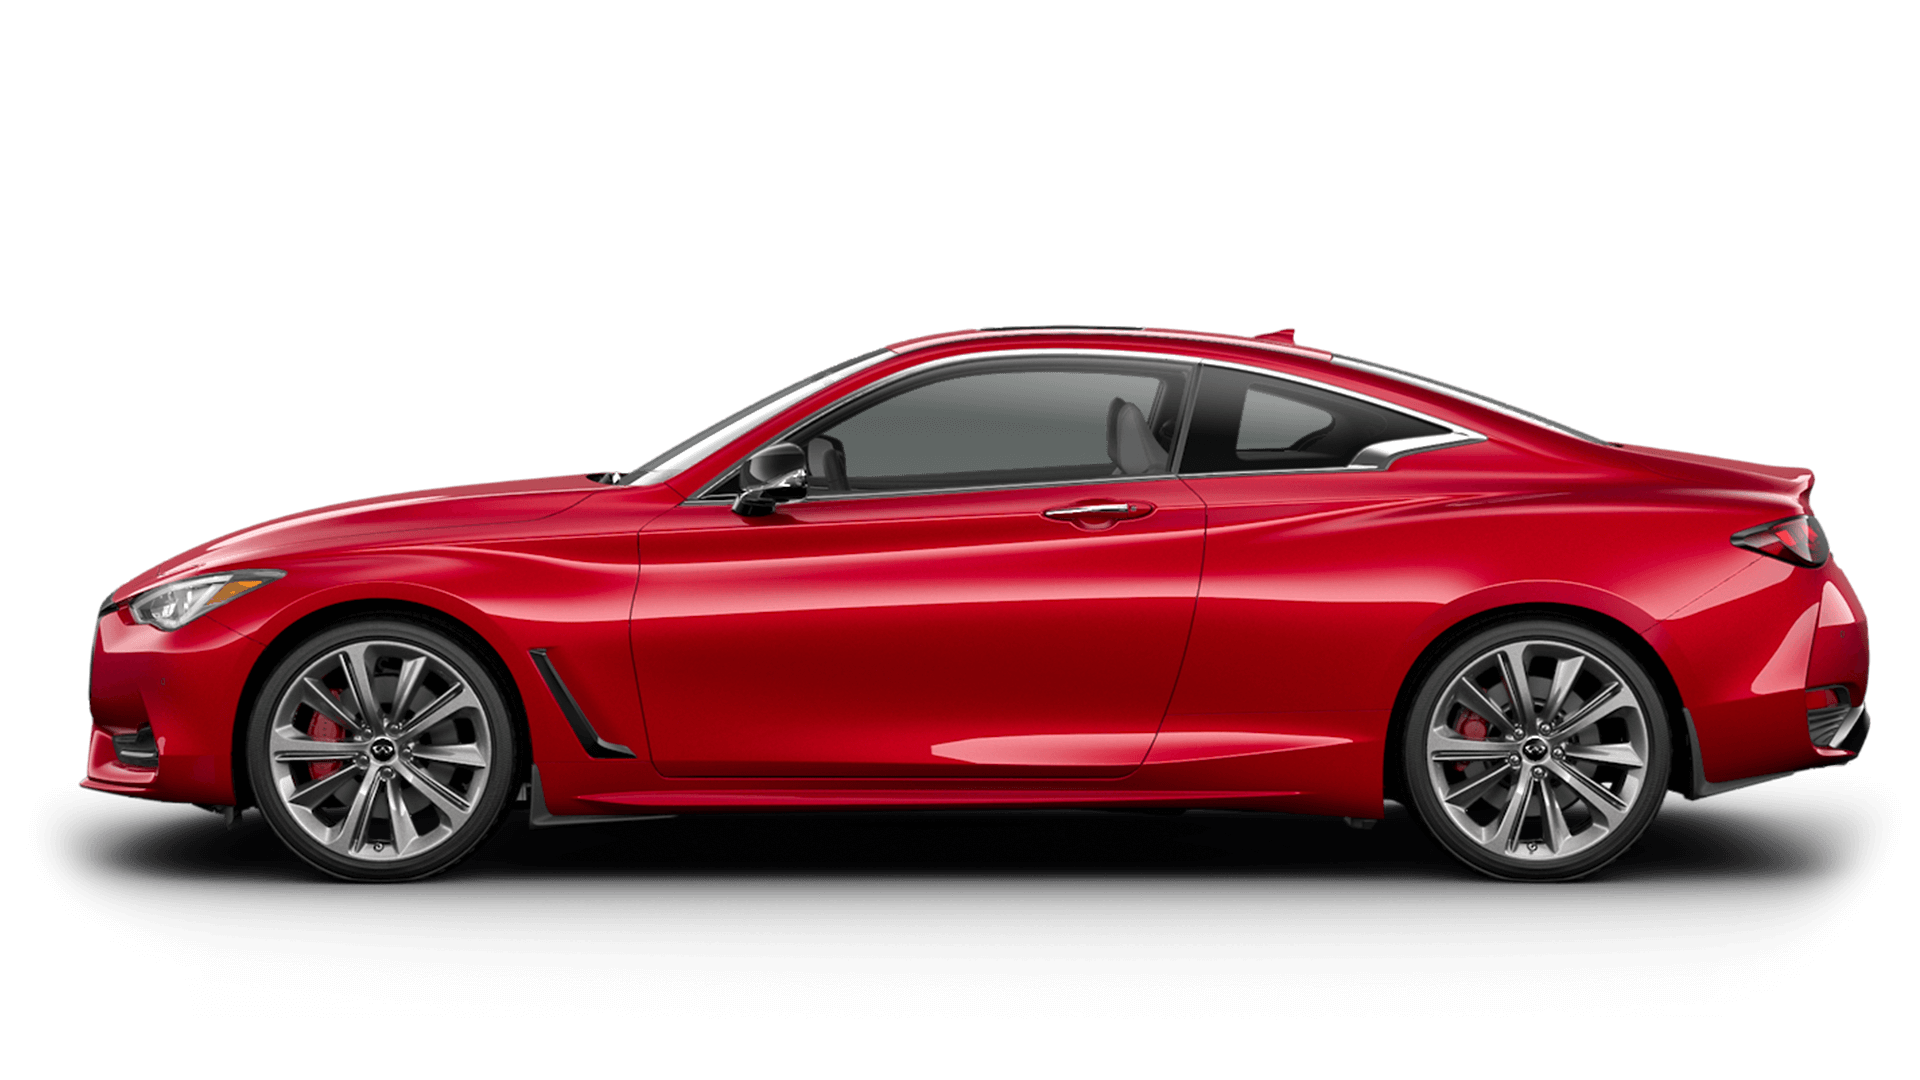 New 2021 Infiniti Q60 Red Sport 400 AWD model for sale at Oxnard Infiniti dealership near Van Nuys, CA